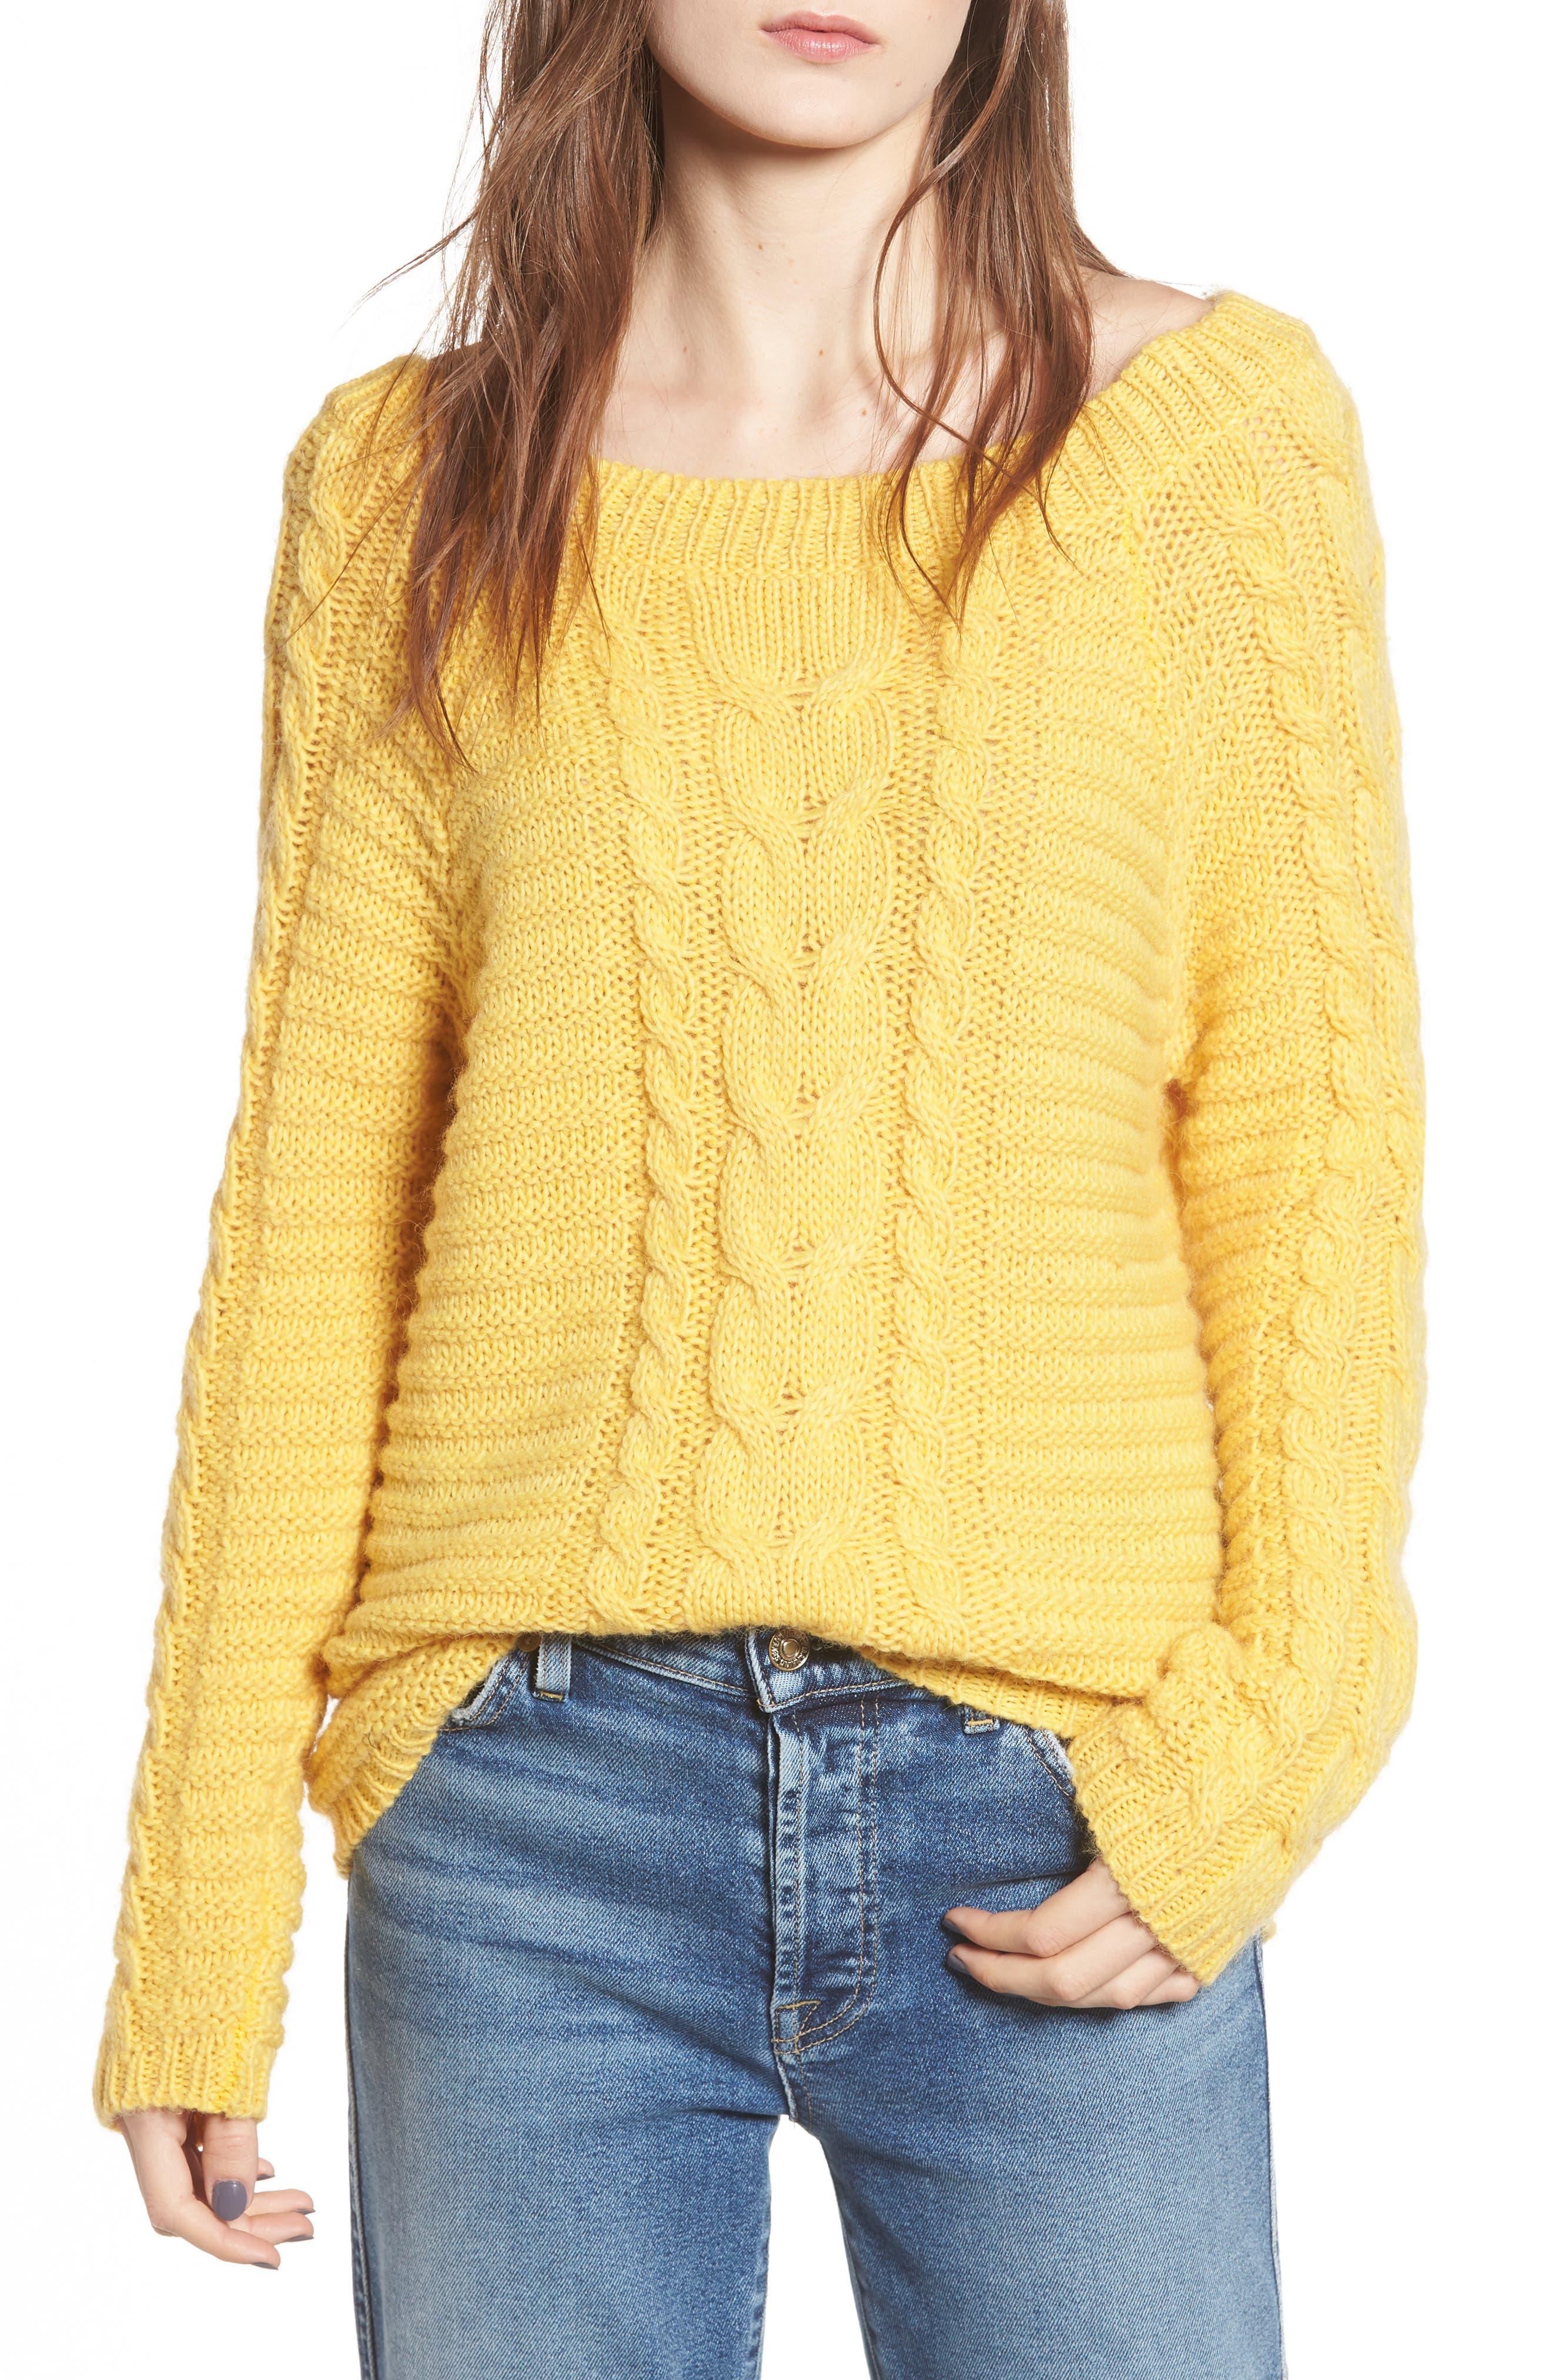 REBECCA MINKOFF Juna Sweater, Main, color, 700